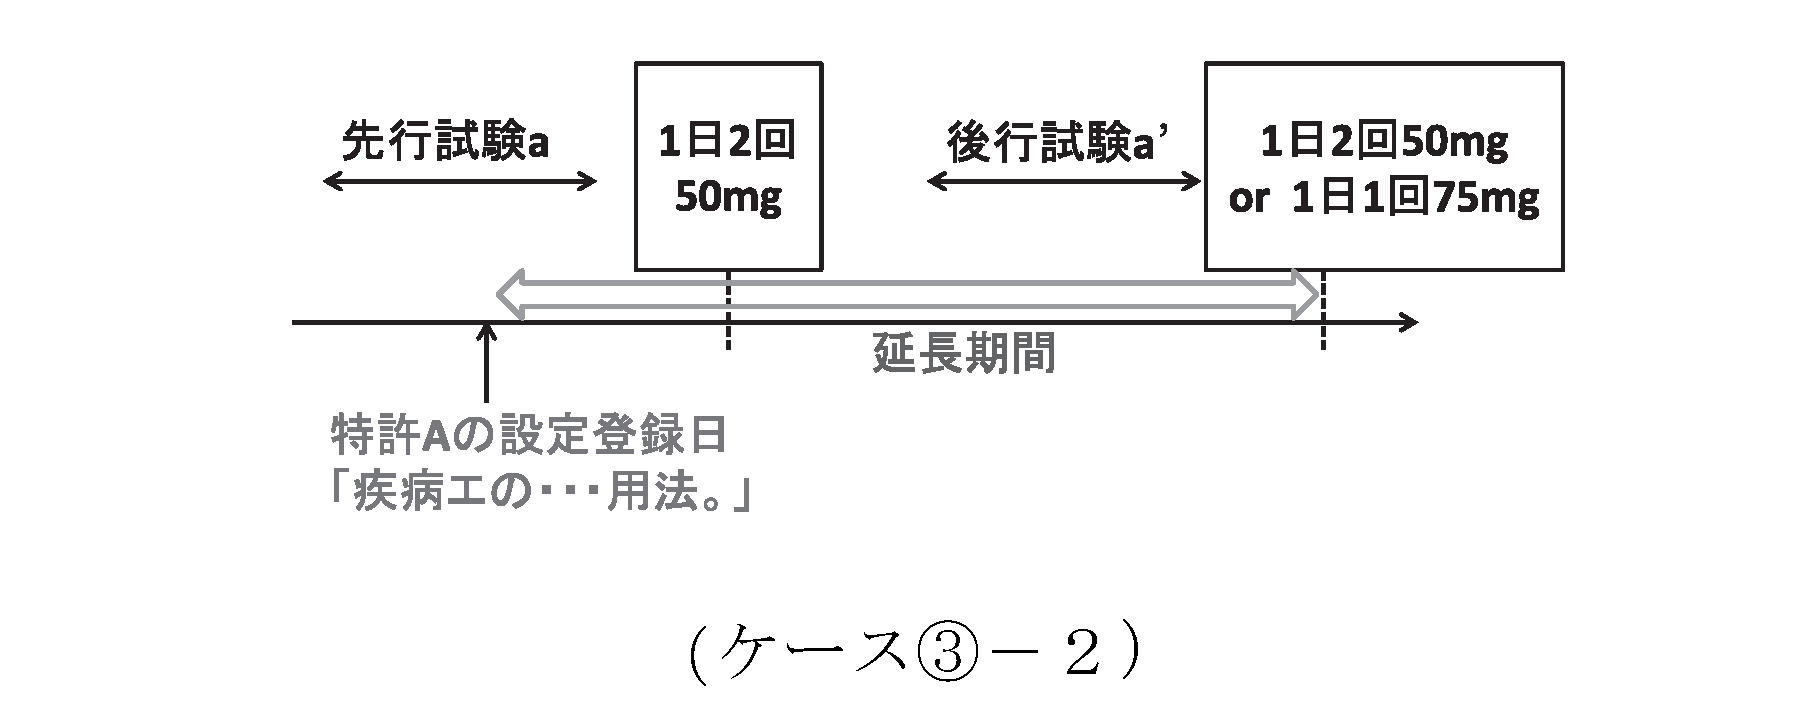 2020shimizu_fig21R.png